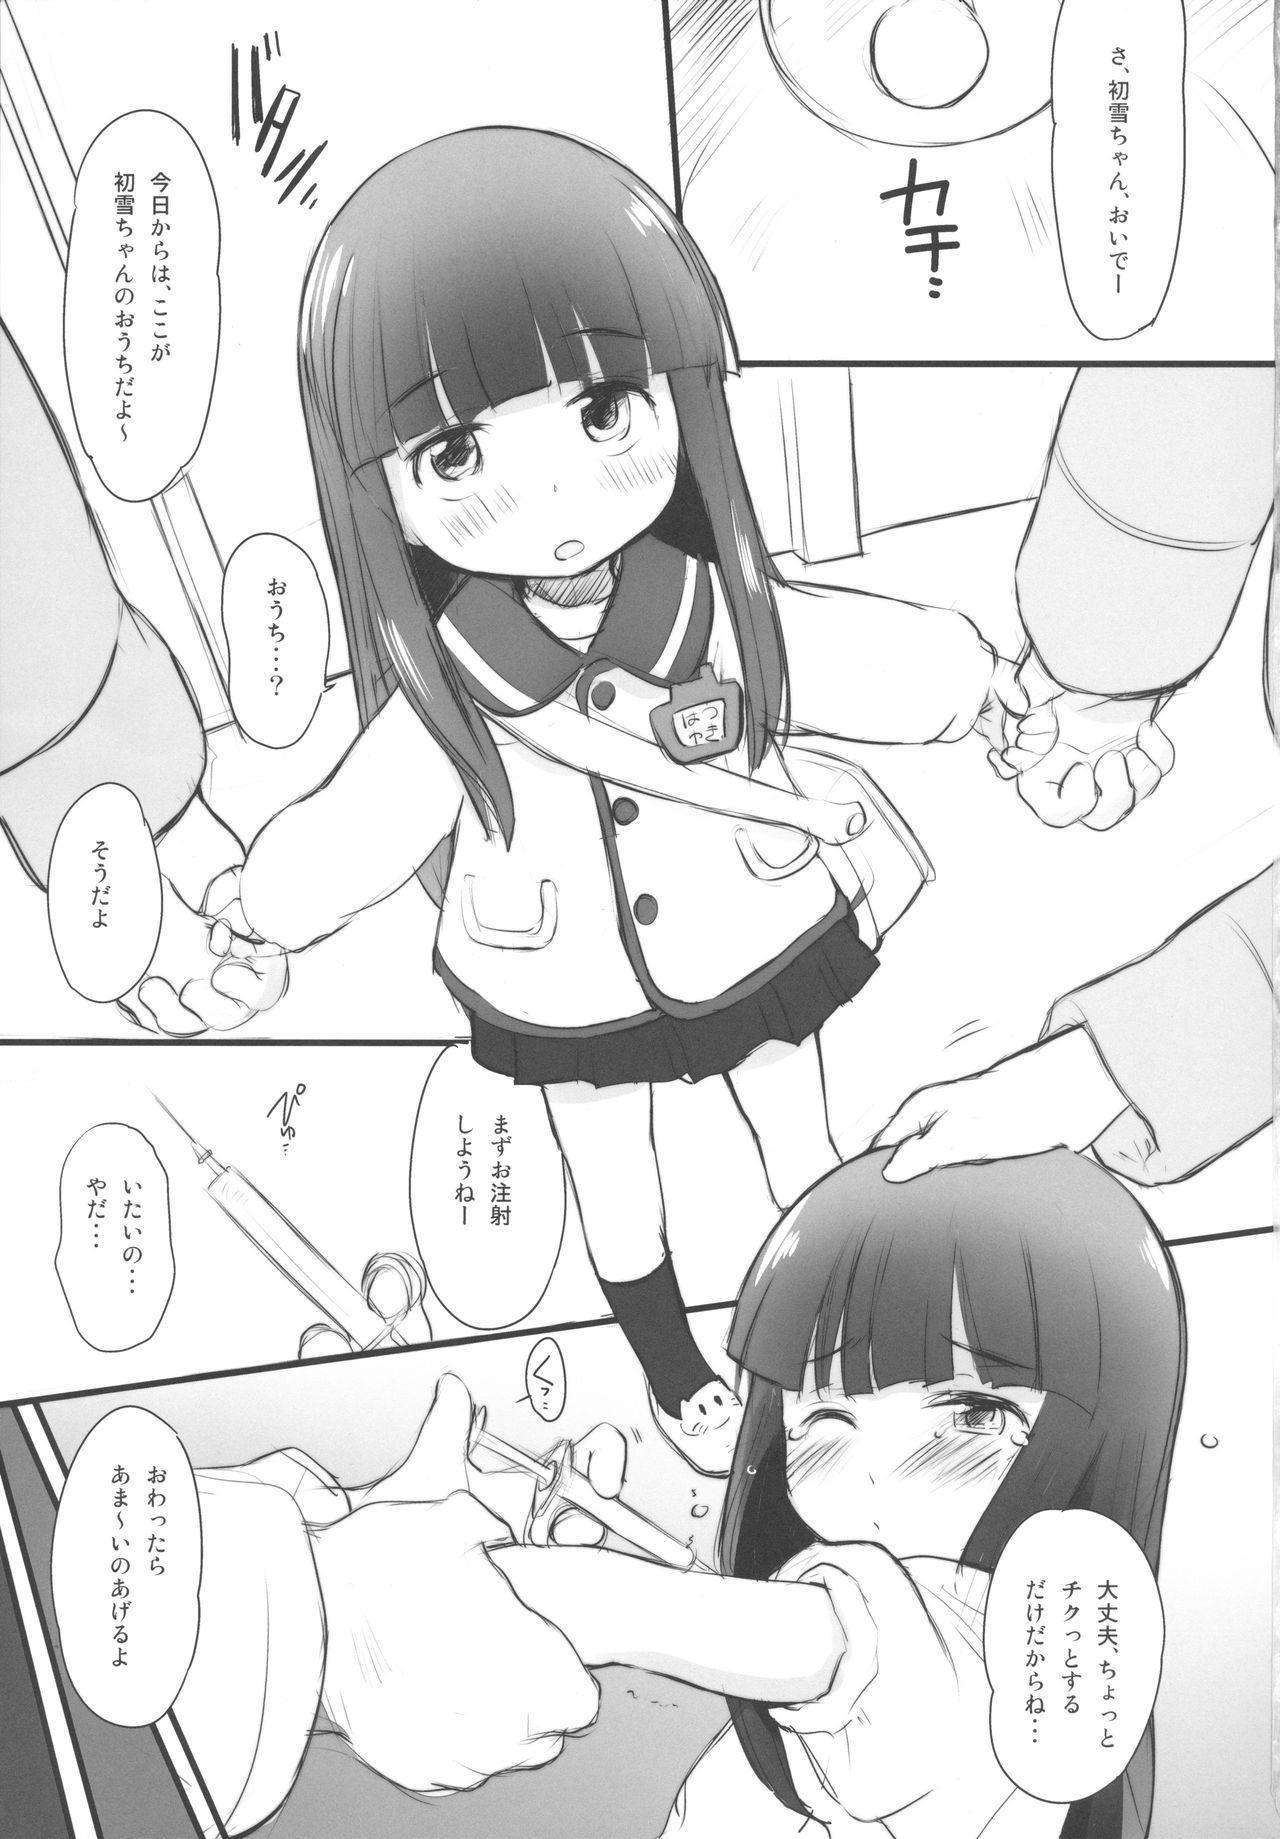 Kuchukukan Hachuyuki Monogatari 2